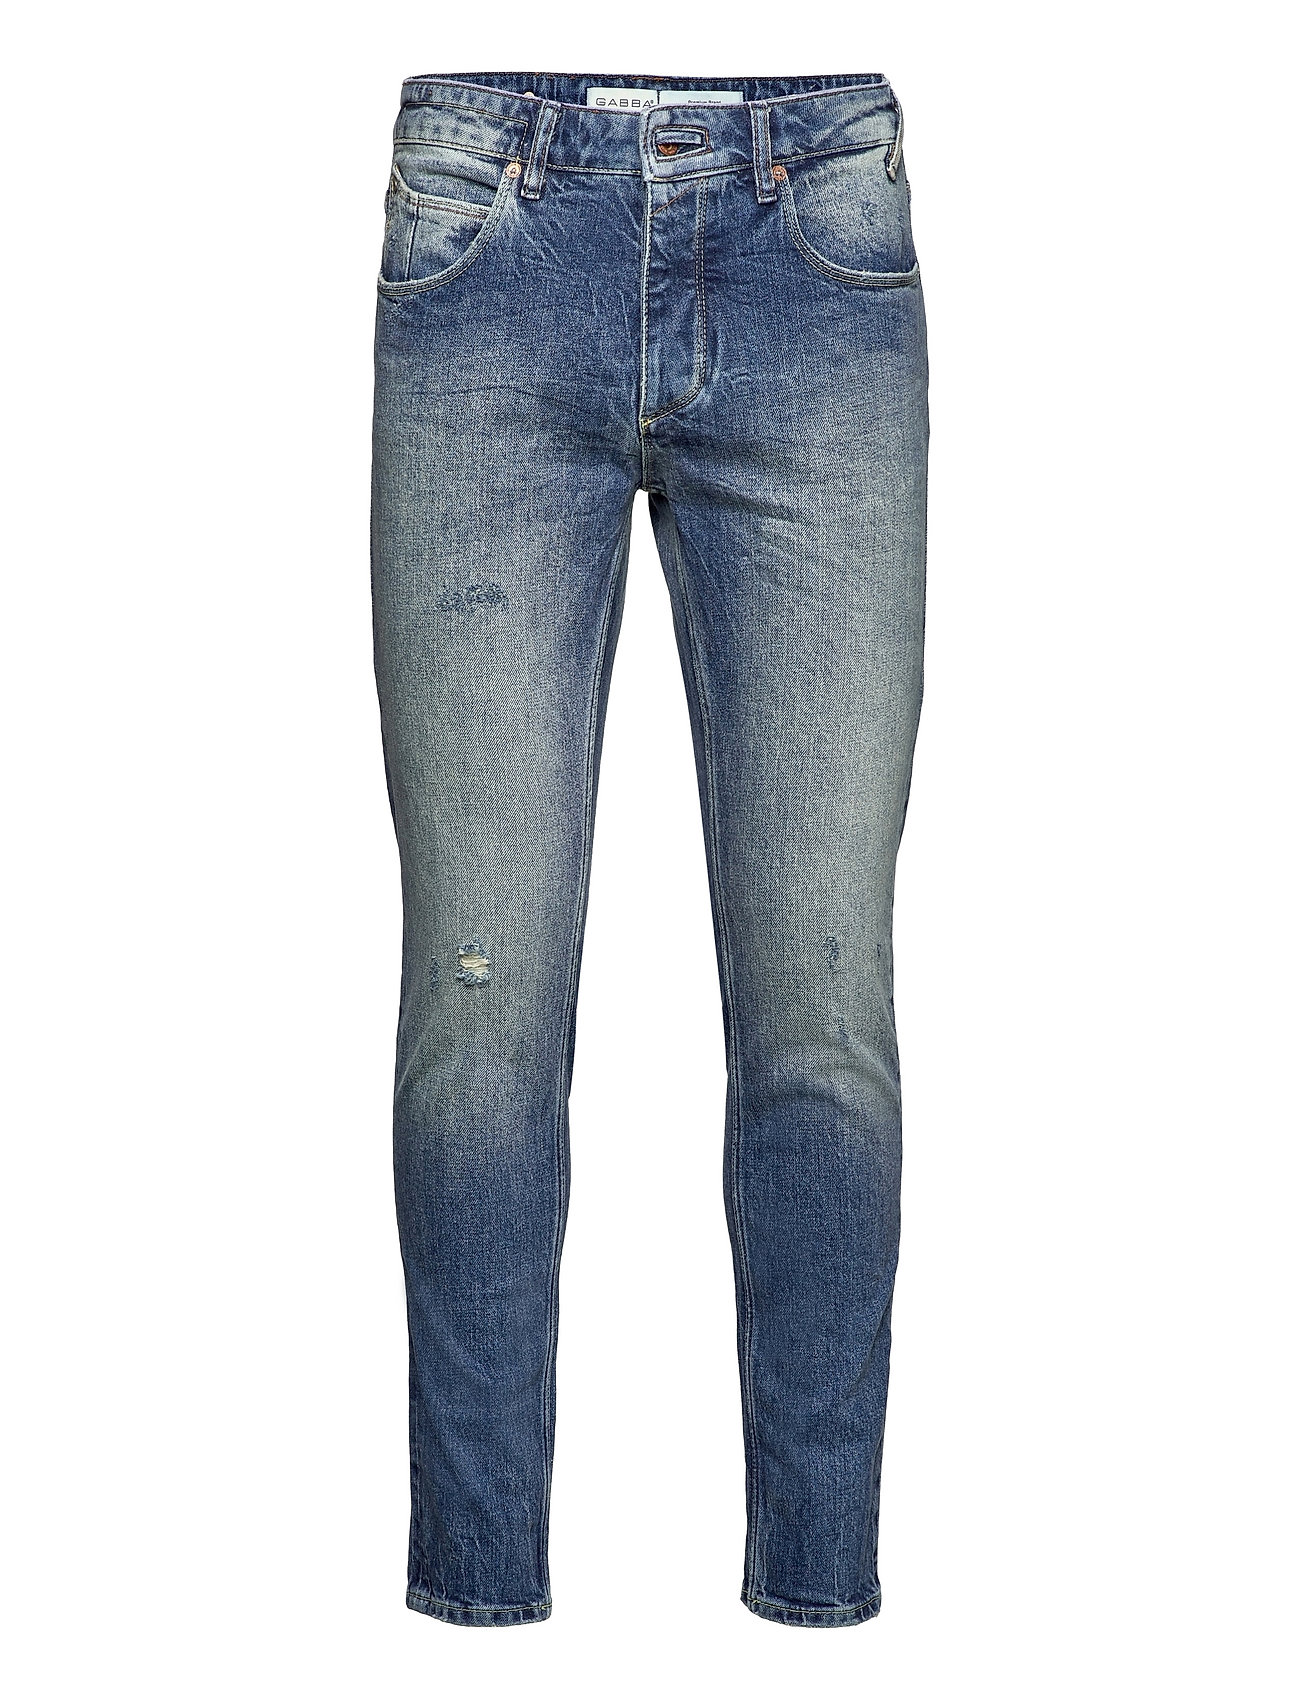 Image of Rey K3830 Jeans Slim Jeans Blå Gabba (3552280391)